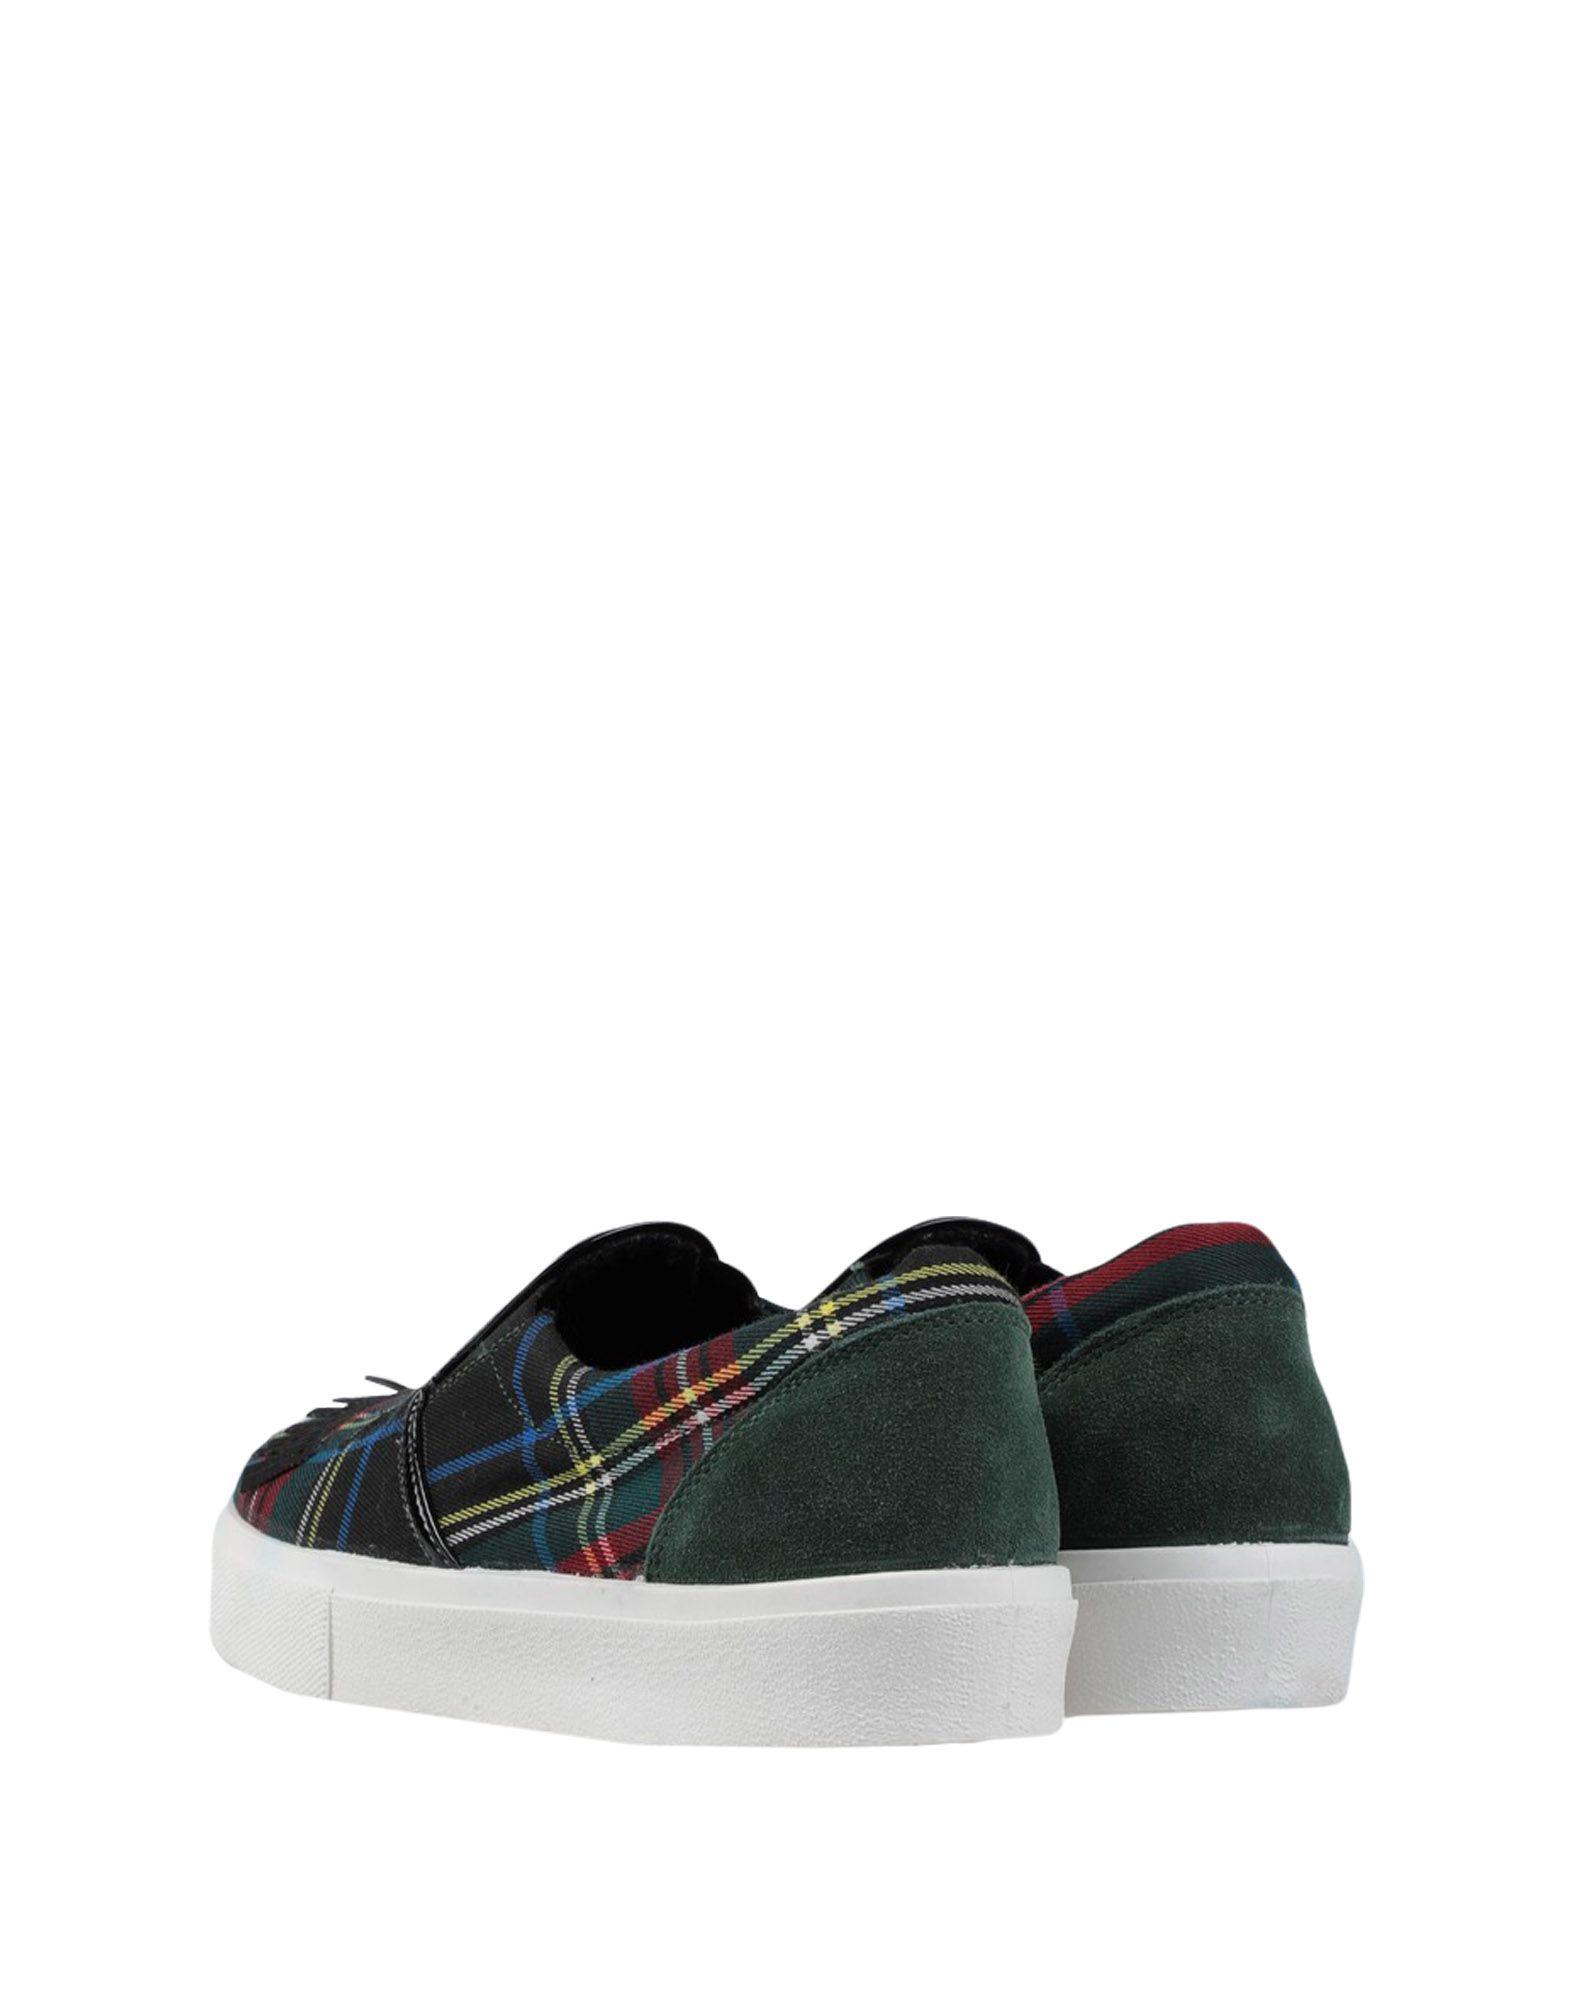 Stilvolle Ferragni billige Schuhe Chiara Ferragni Stilvolle Sneakers Damen  11551758RU 020085